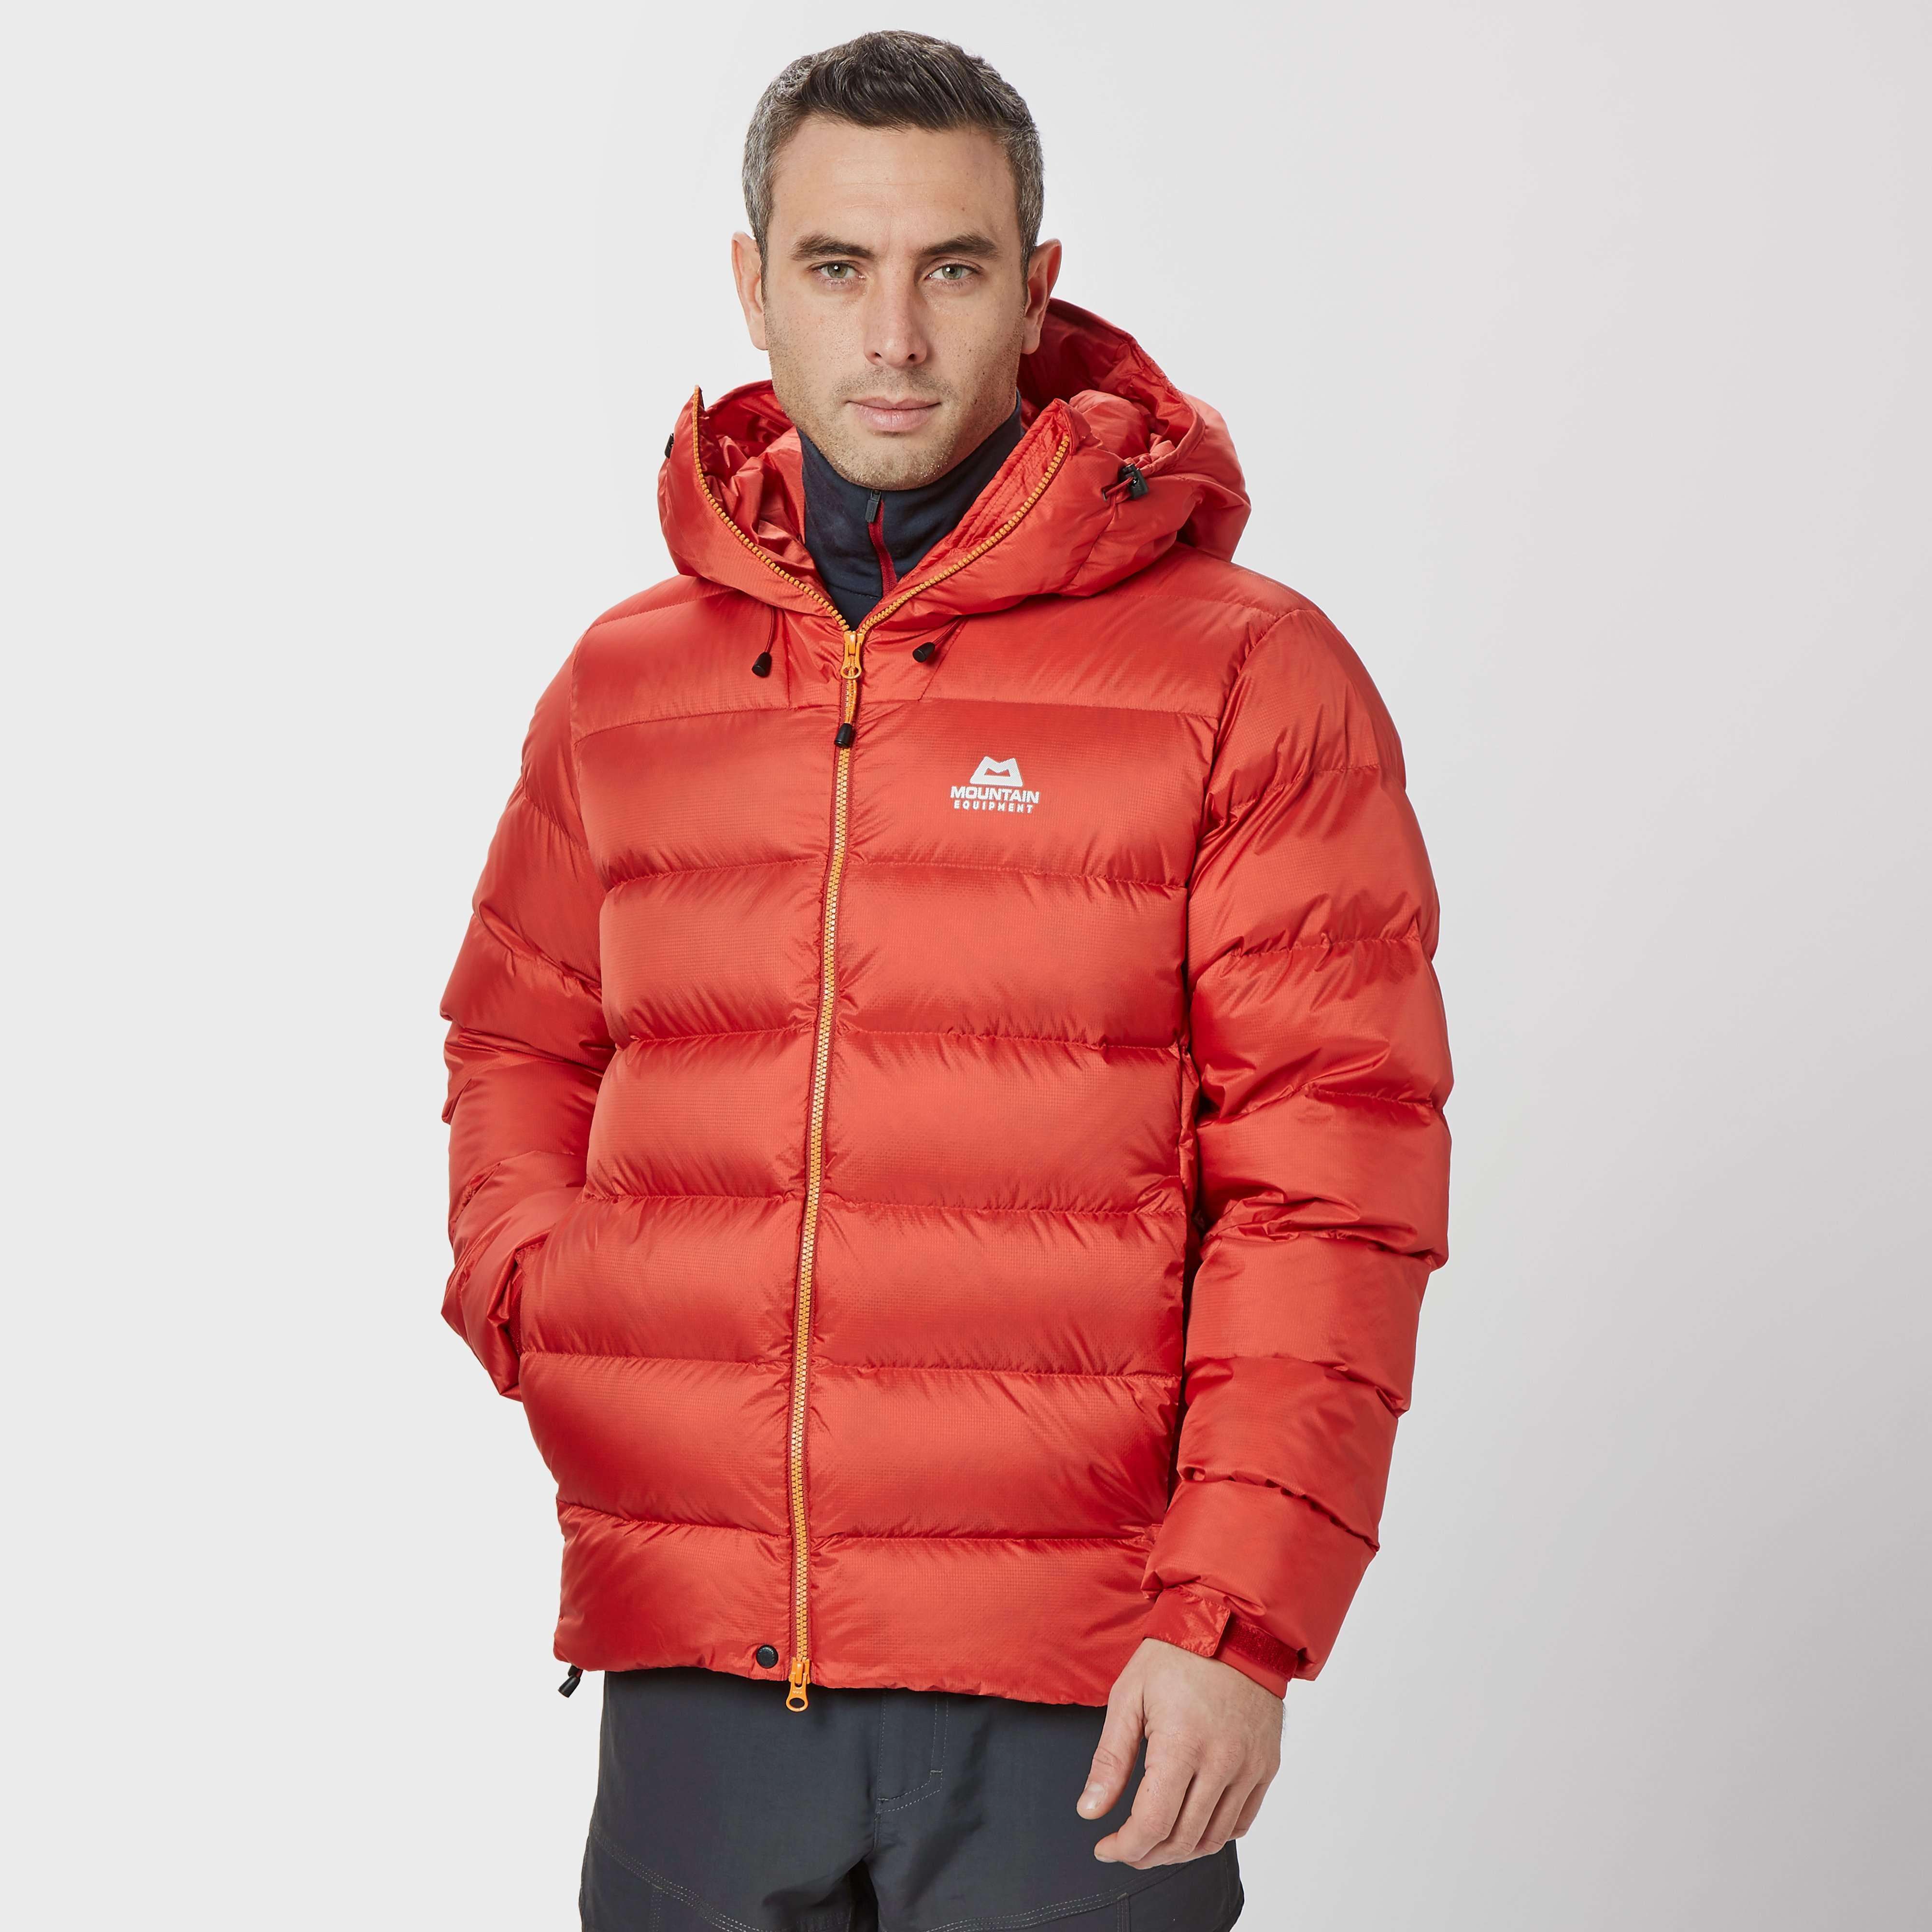 MOUNTAIN EQUIPMENT Men's Vega Down Jacket